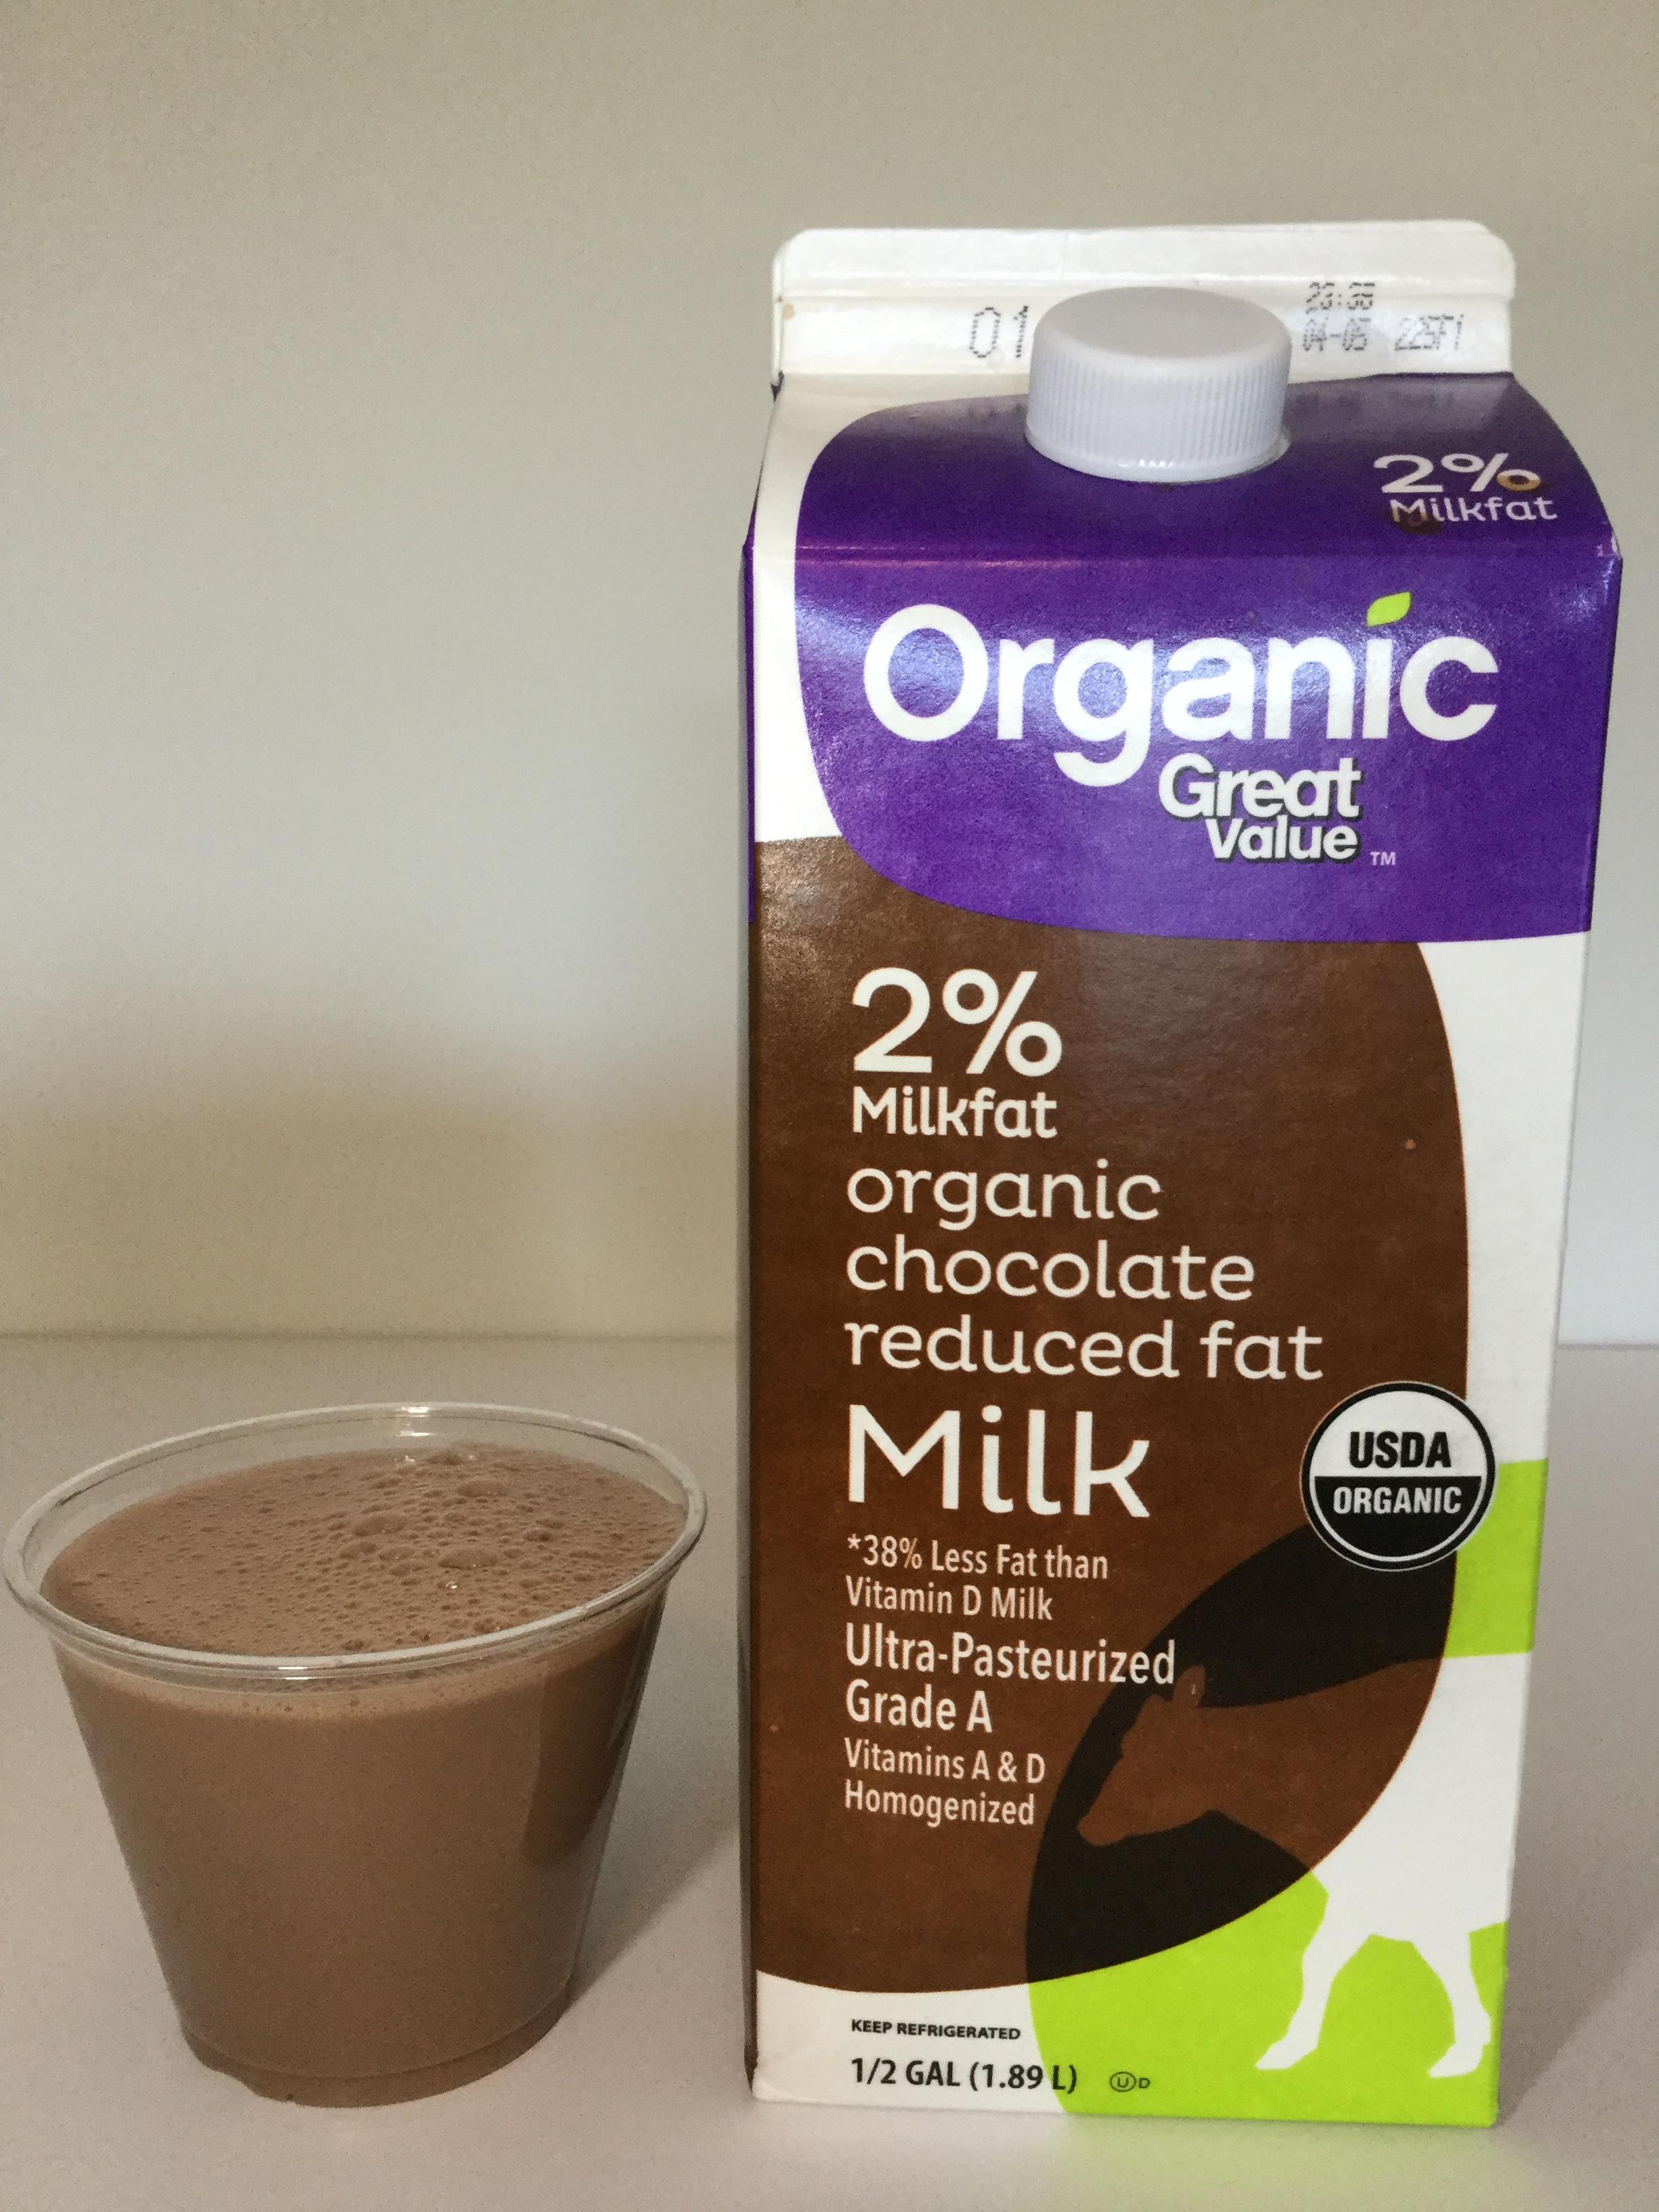 Great Value Organic Chocolate Milk Cup